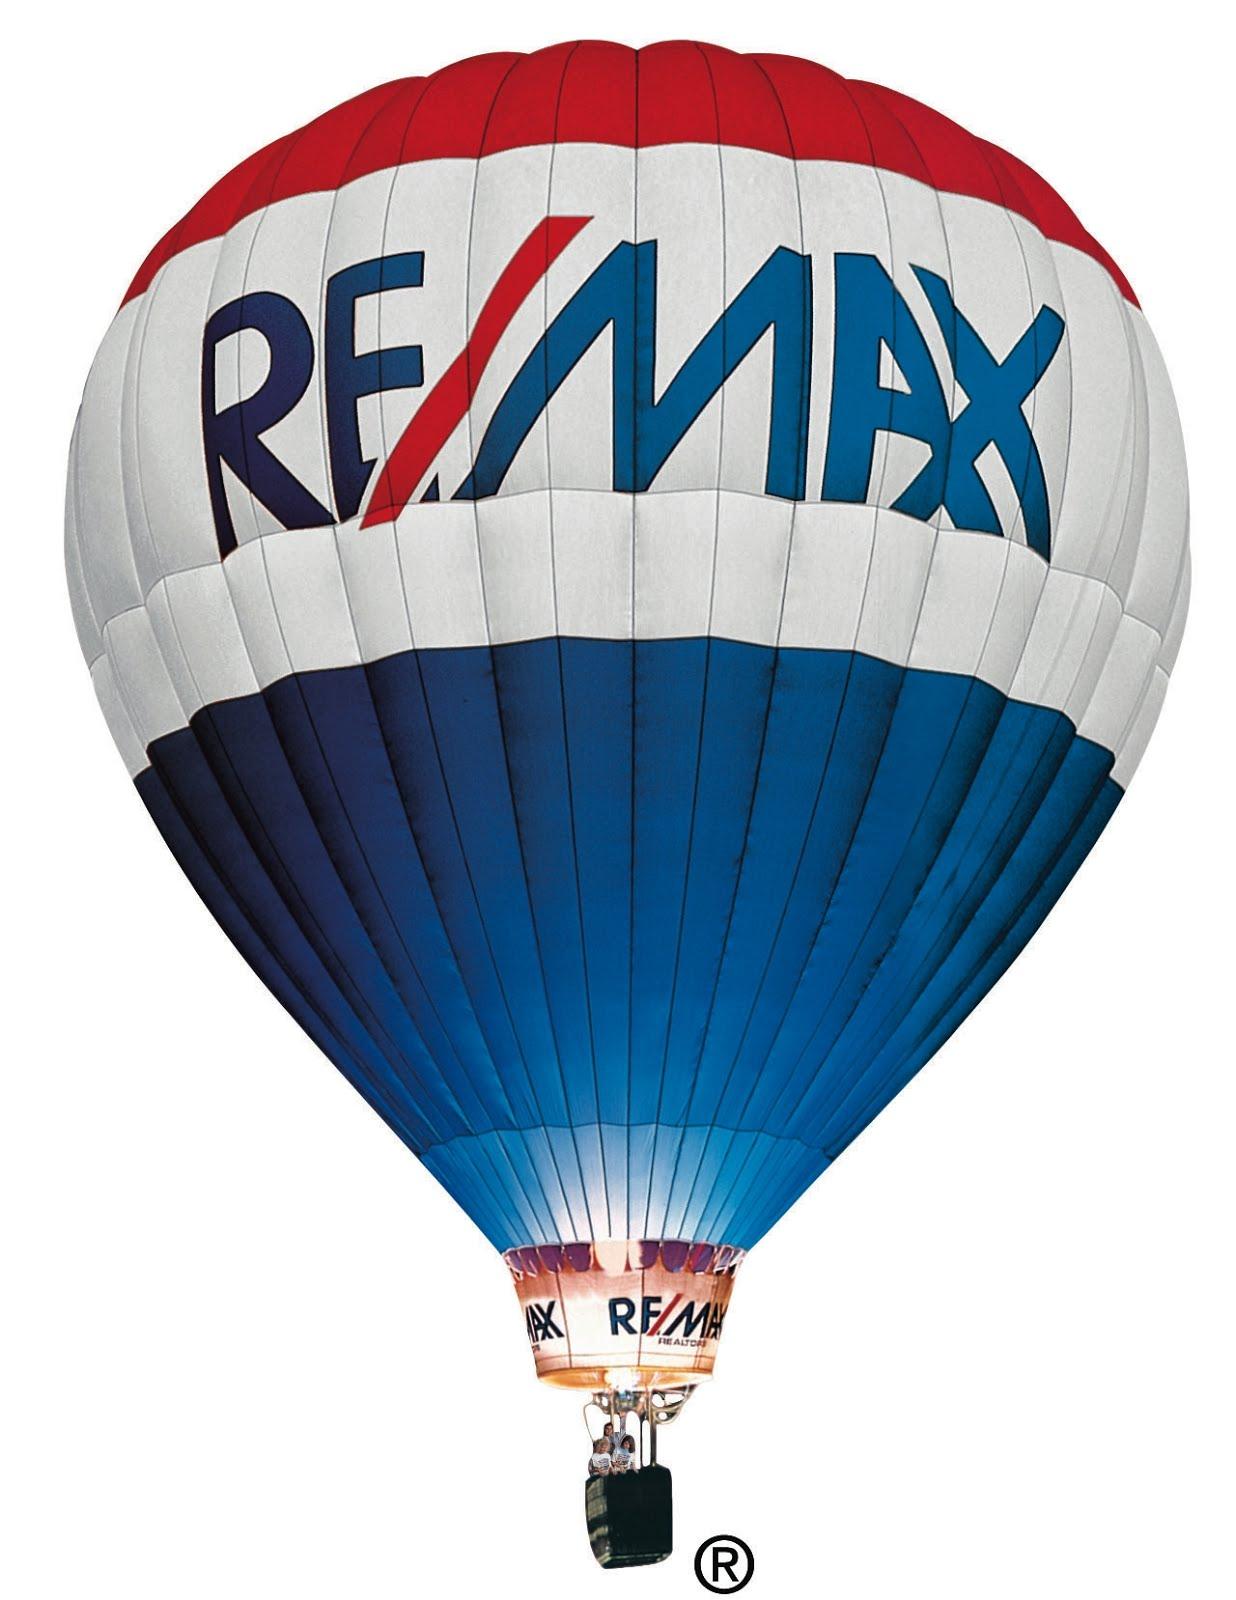 REMAX Real Estate Concepts